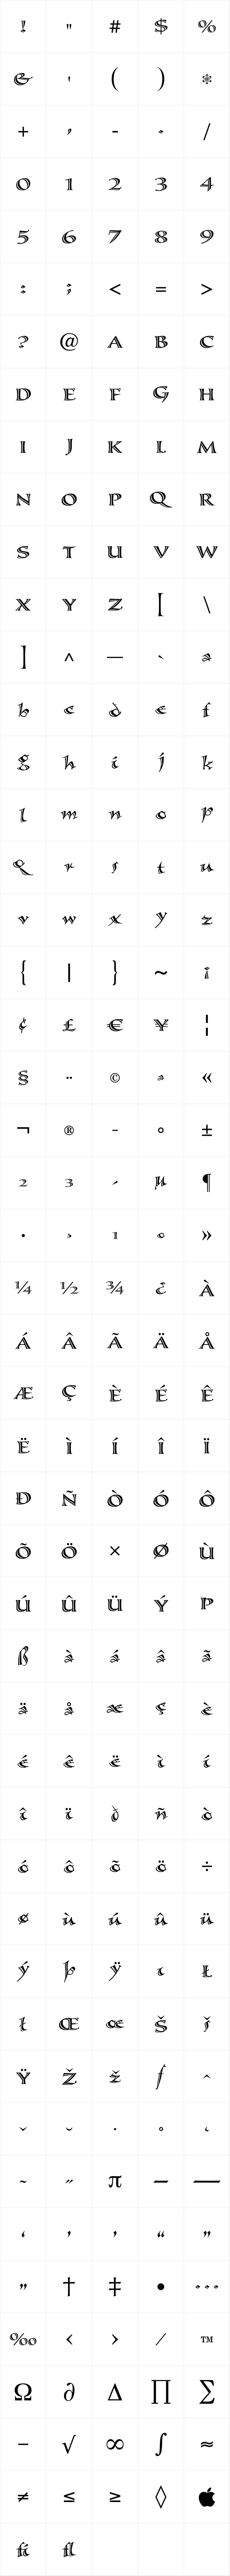 Calligraphica SX